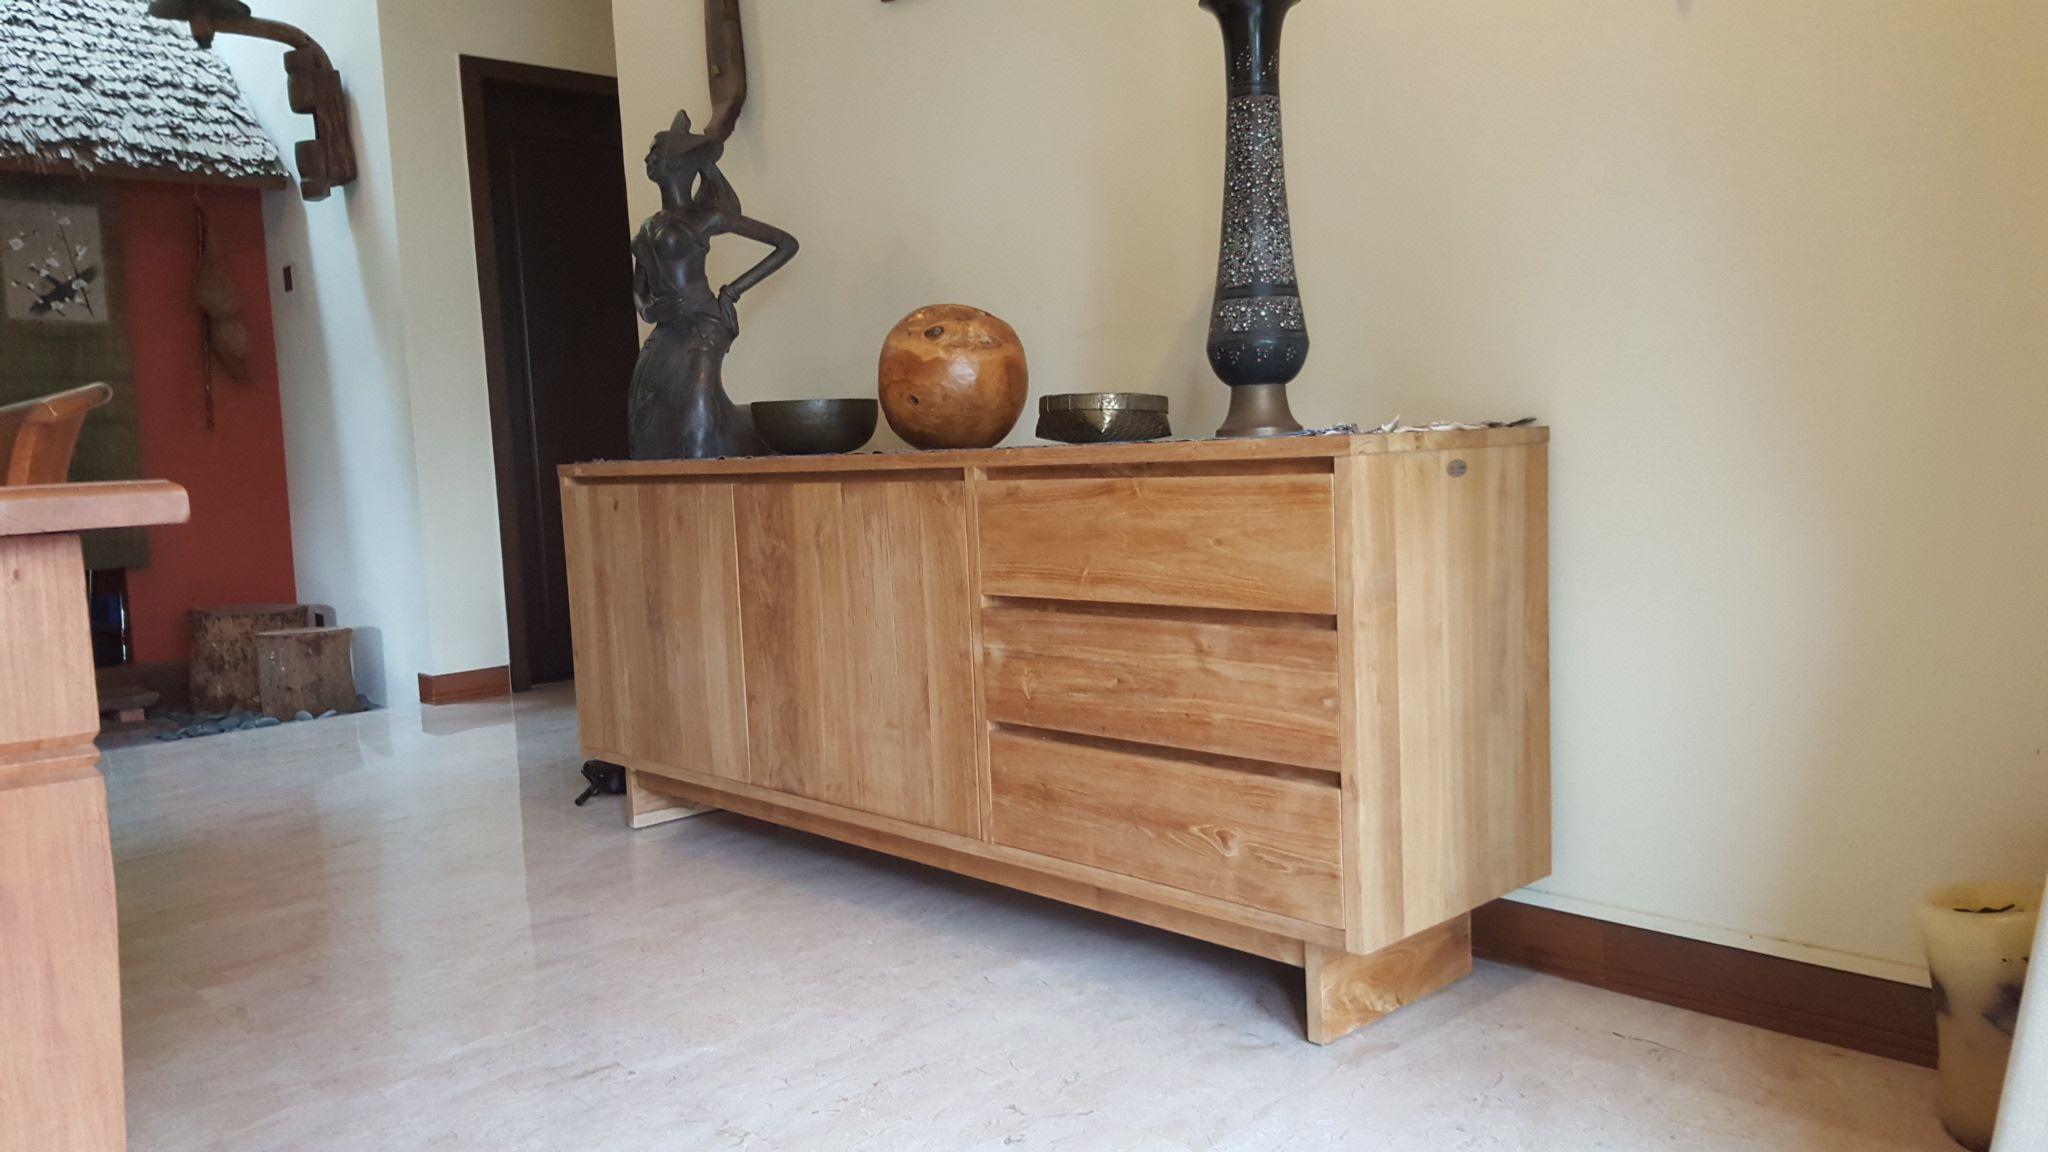 Teak Furniture Malaysia Teak Wood Furniture Shop Selangor Malaysia Home Furniture Shopping Teak Wood Furniture Wood Furniture Store